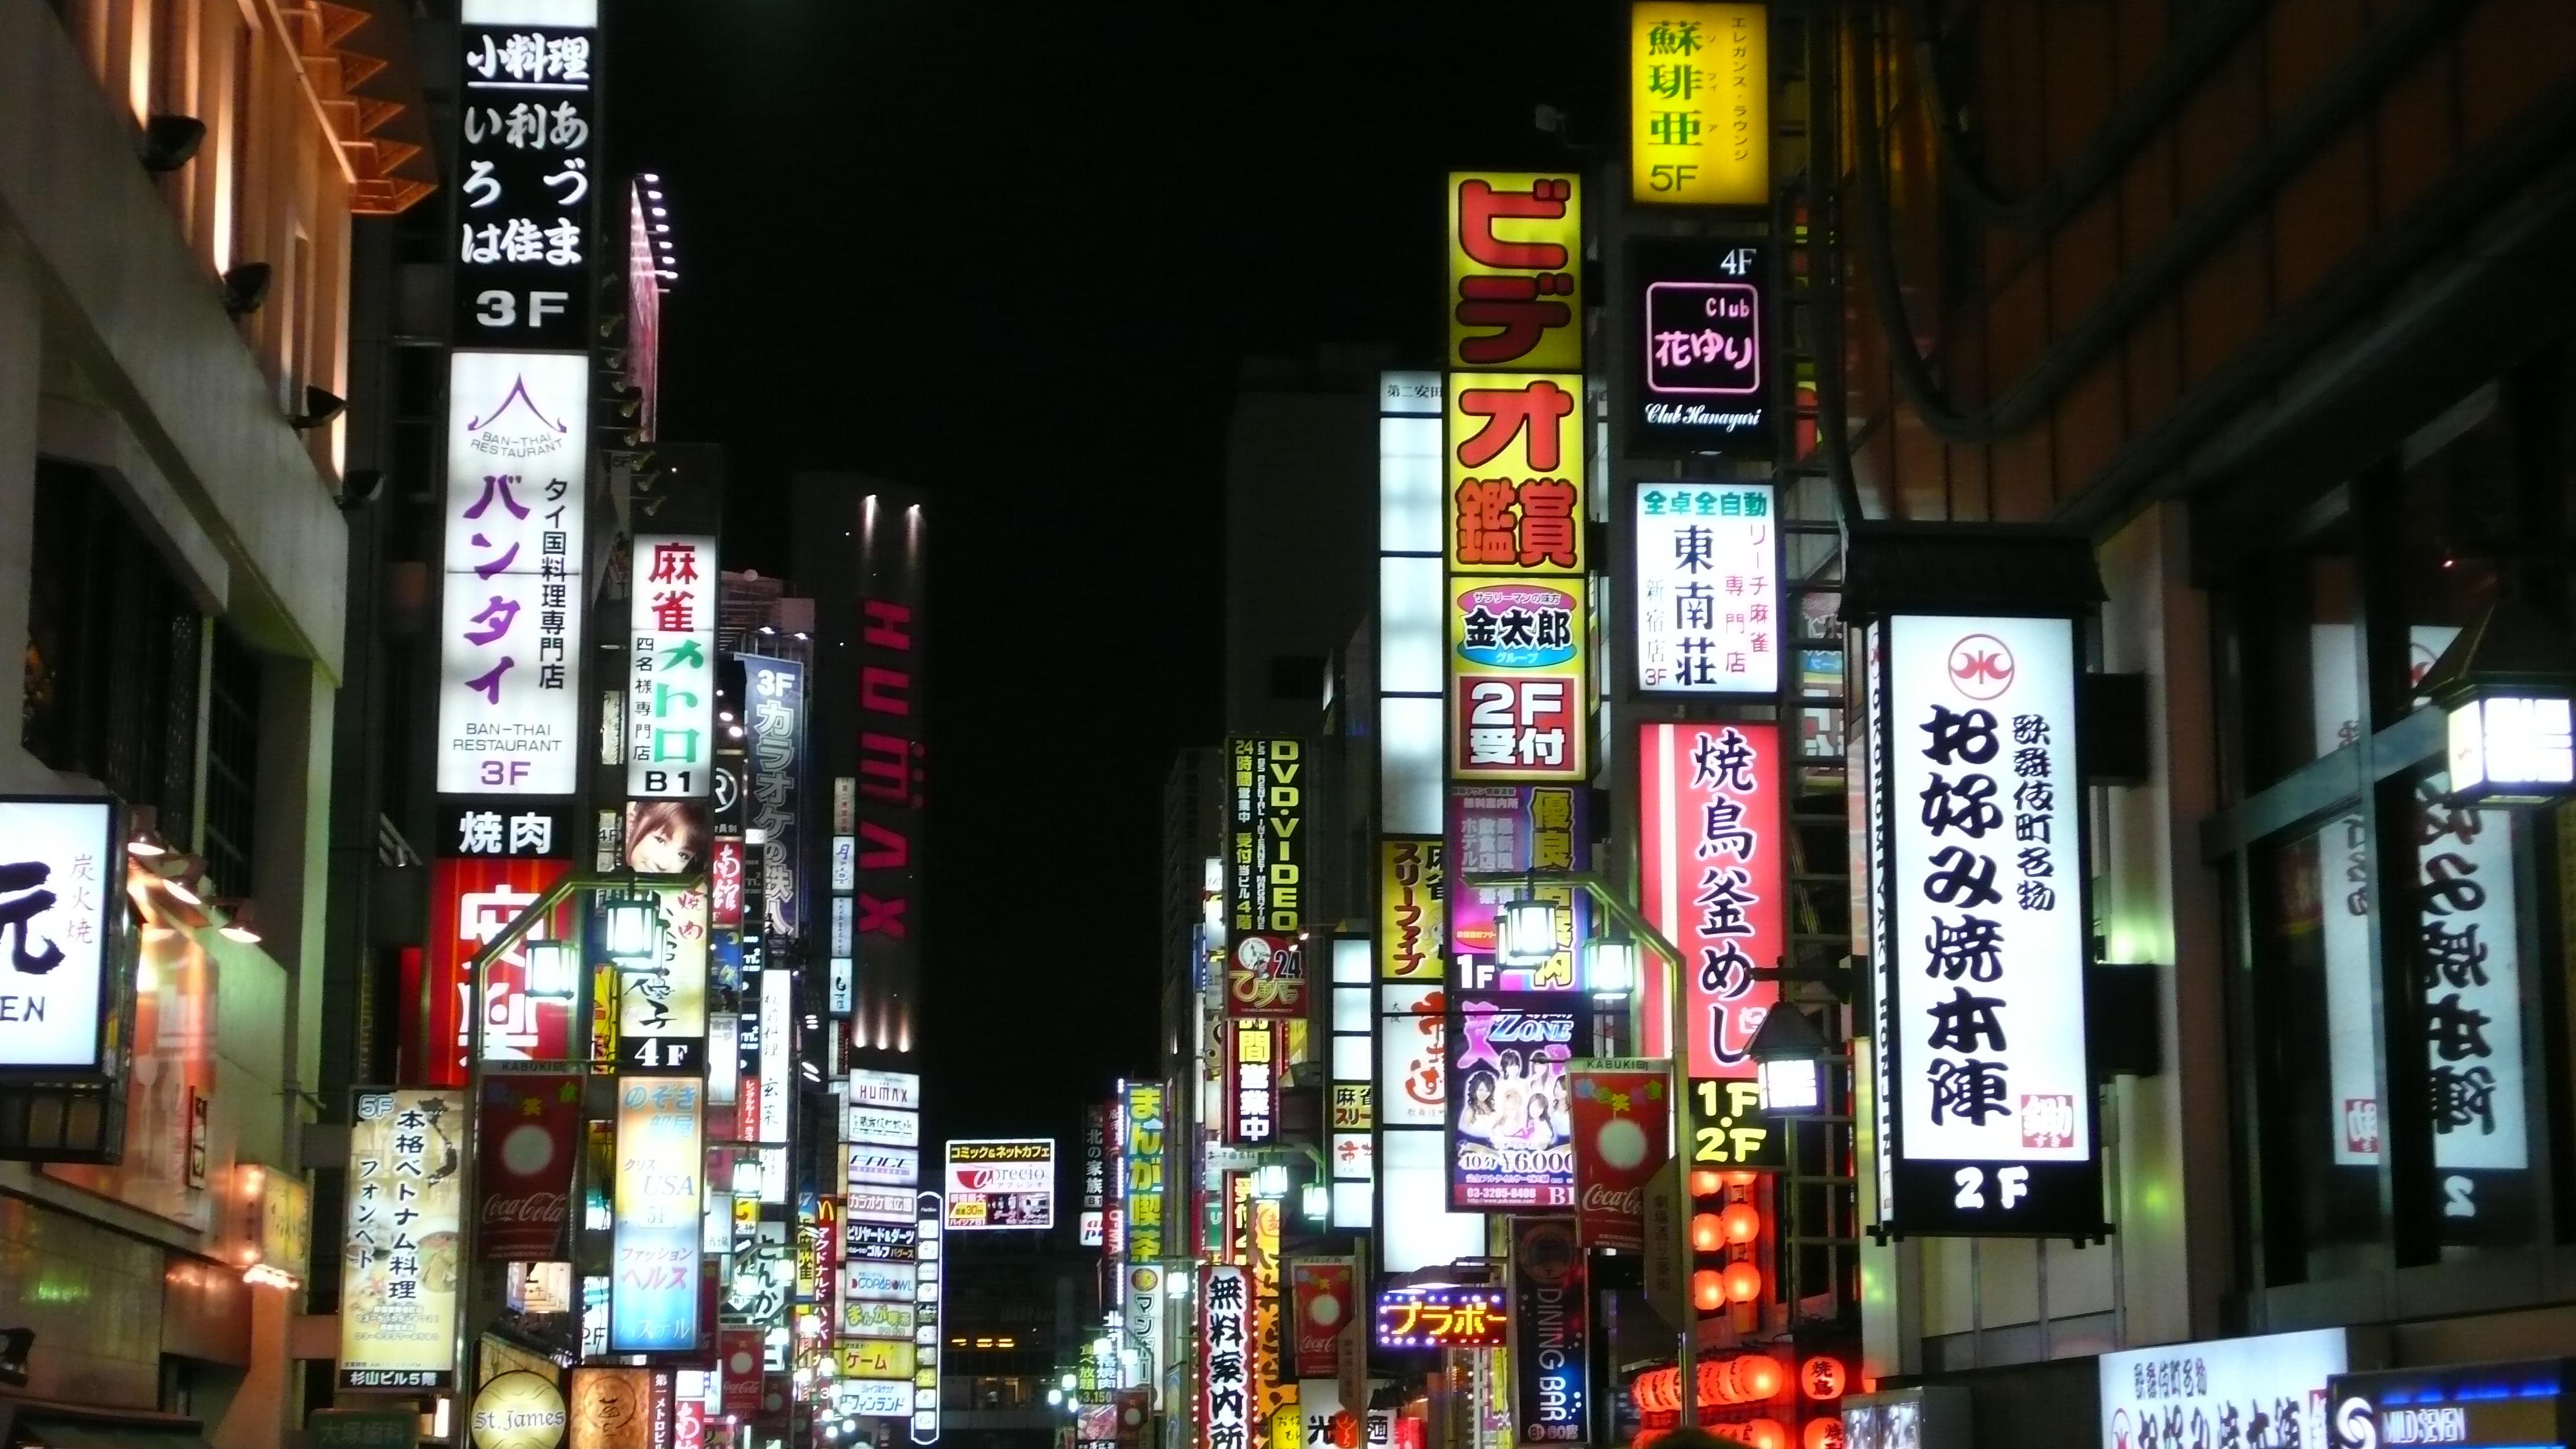 Neon Box Tokyo City Wallpaper 12158 Wallpaper ForWallpaperscom 4224x2376